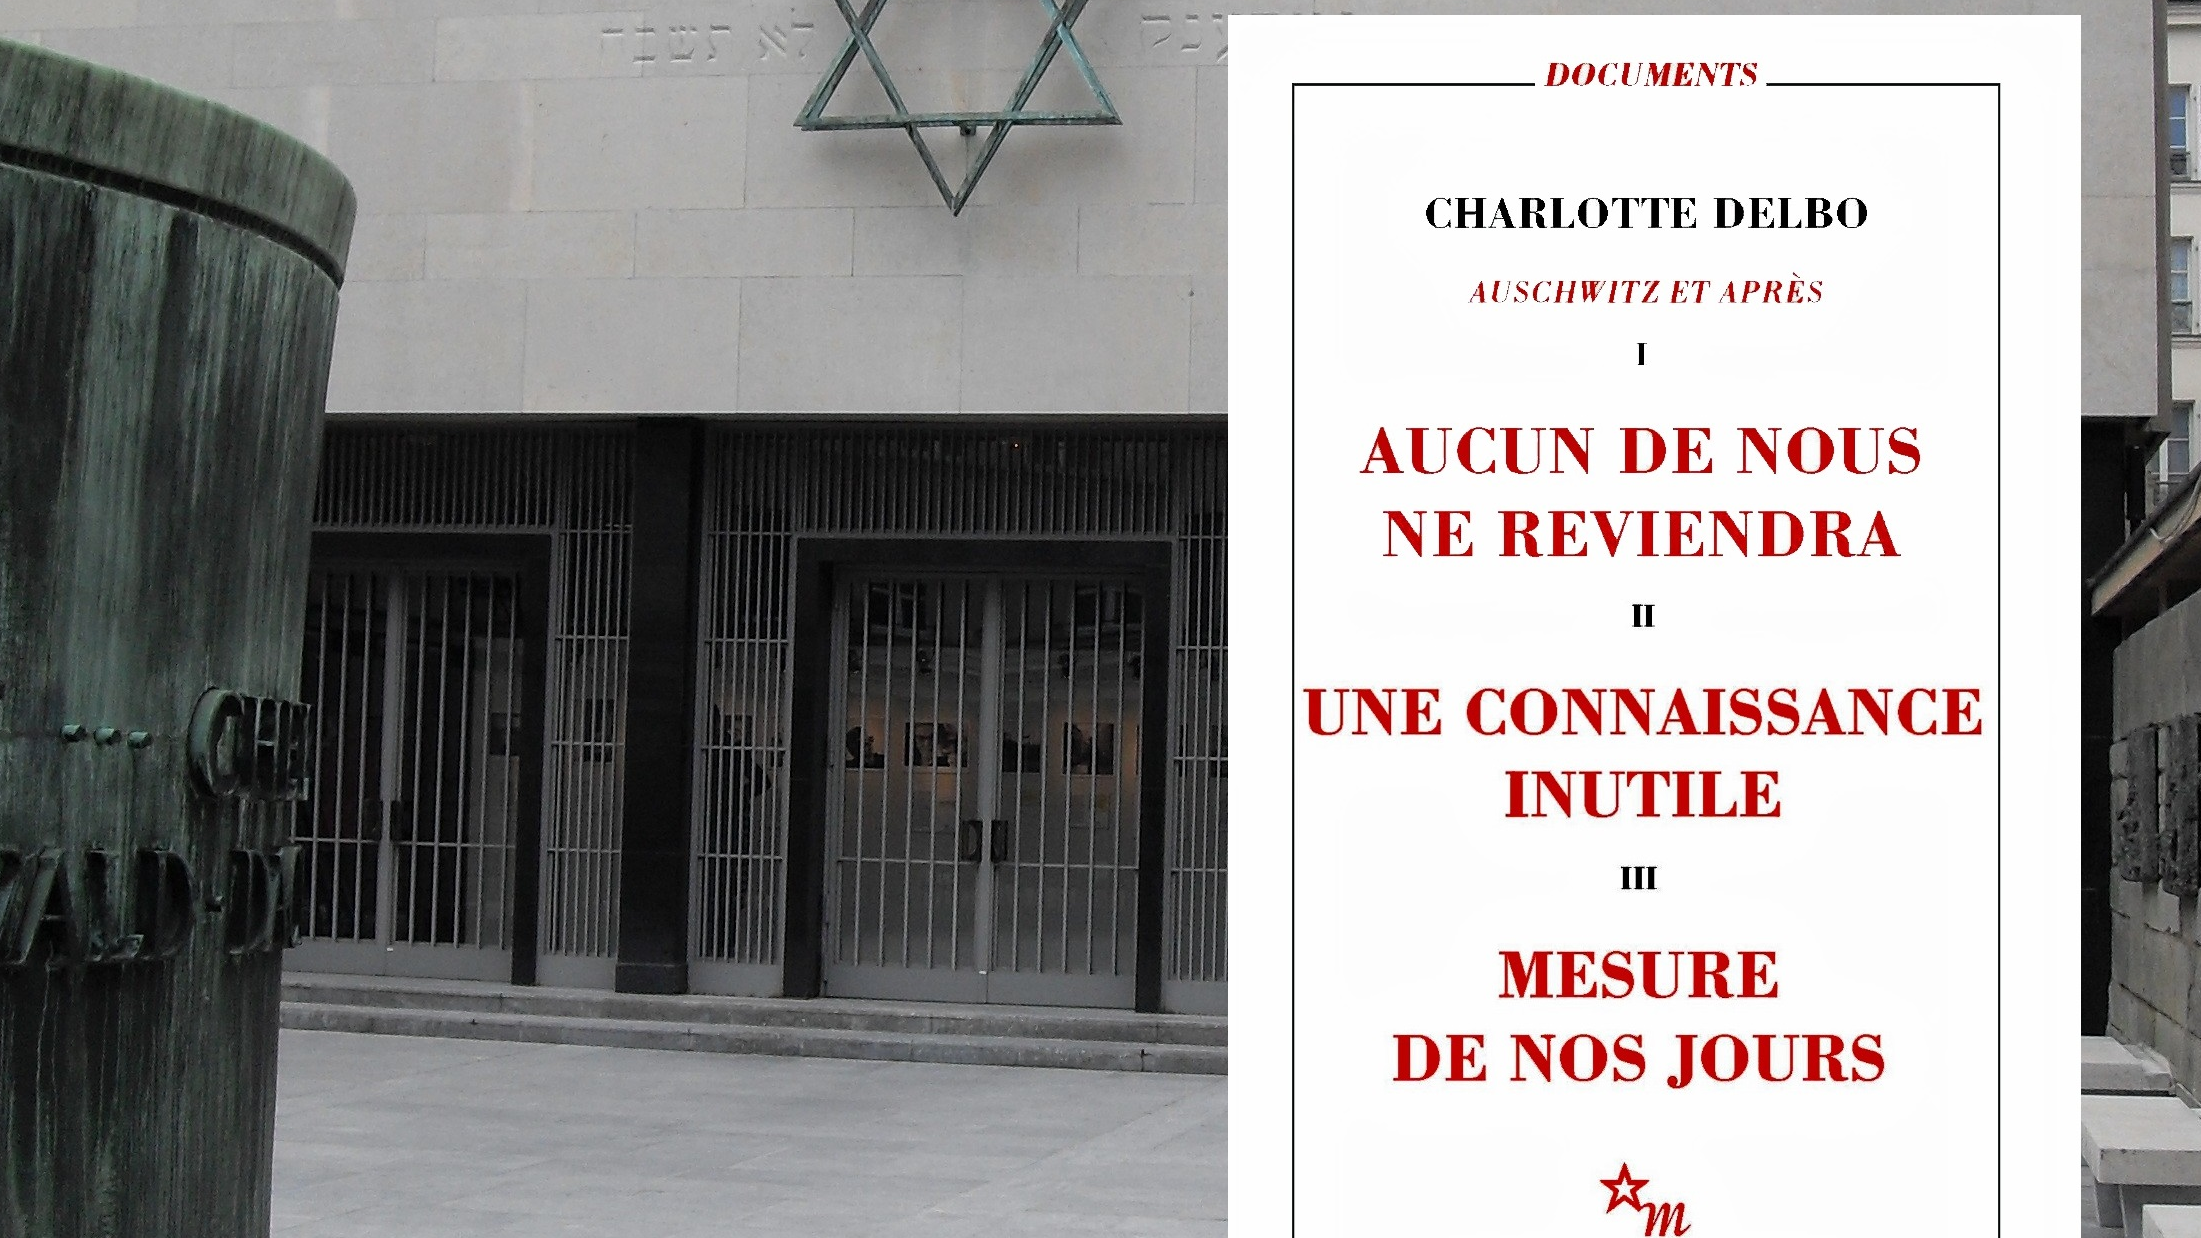 Paris_Marais_Memorial_de_la_Shoah_cour-1524057646.jpg